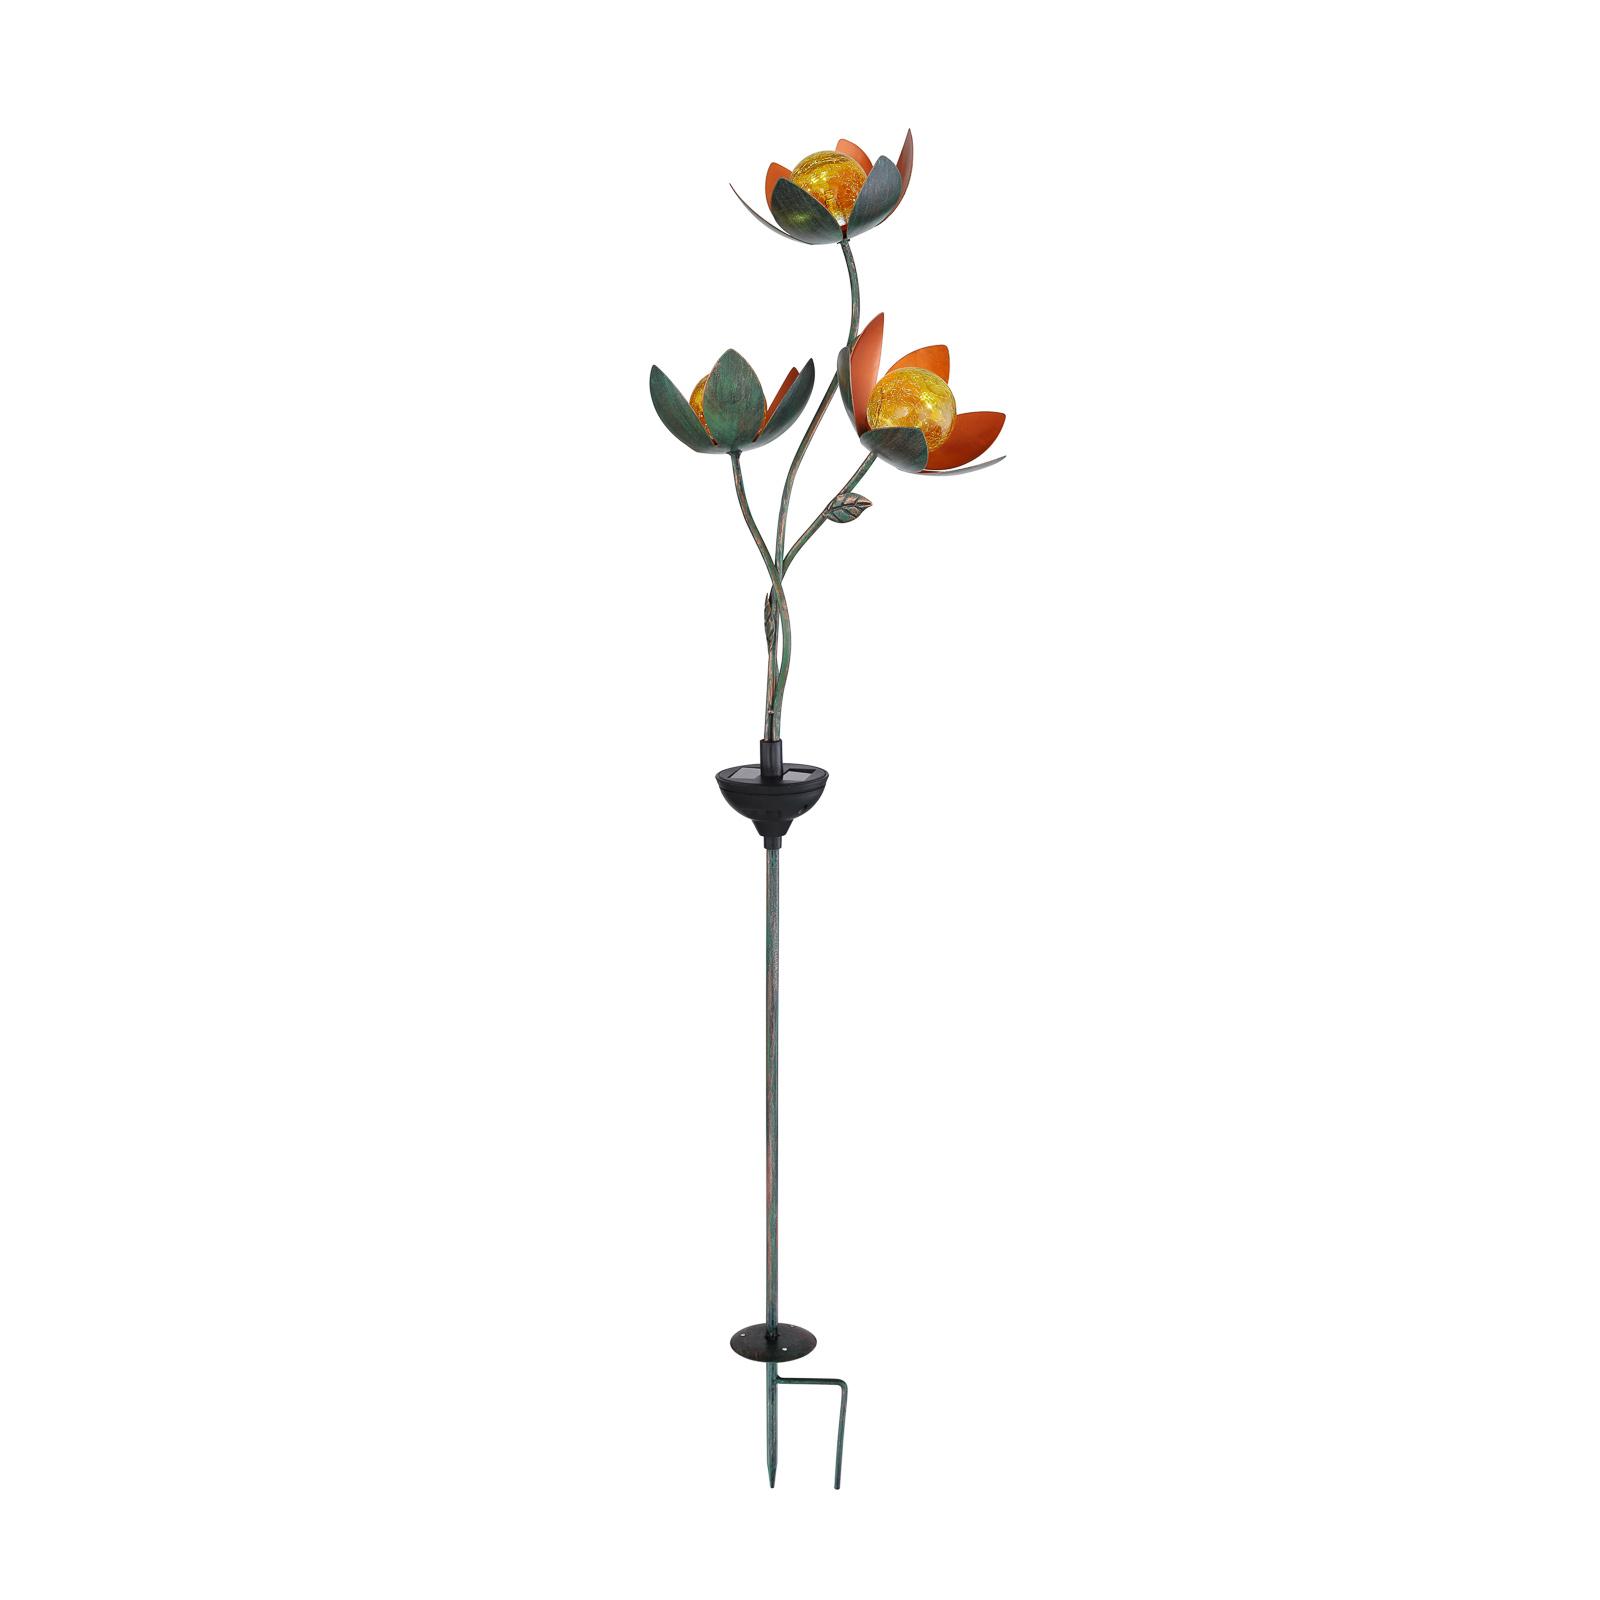 Solcelle-dekolampe 33654 jordspyd 3 blomster